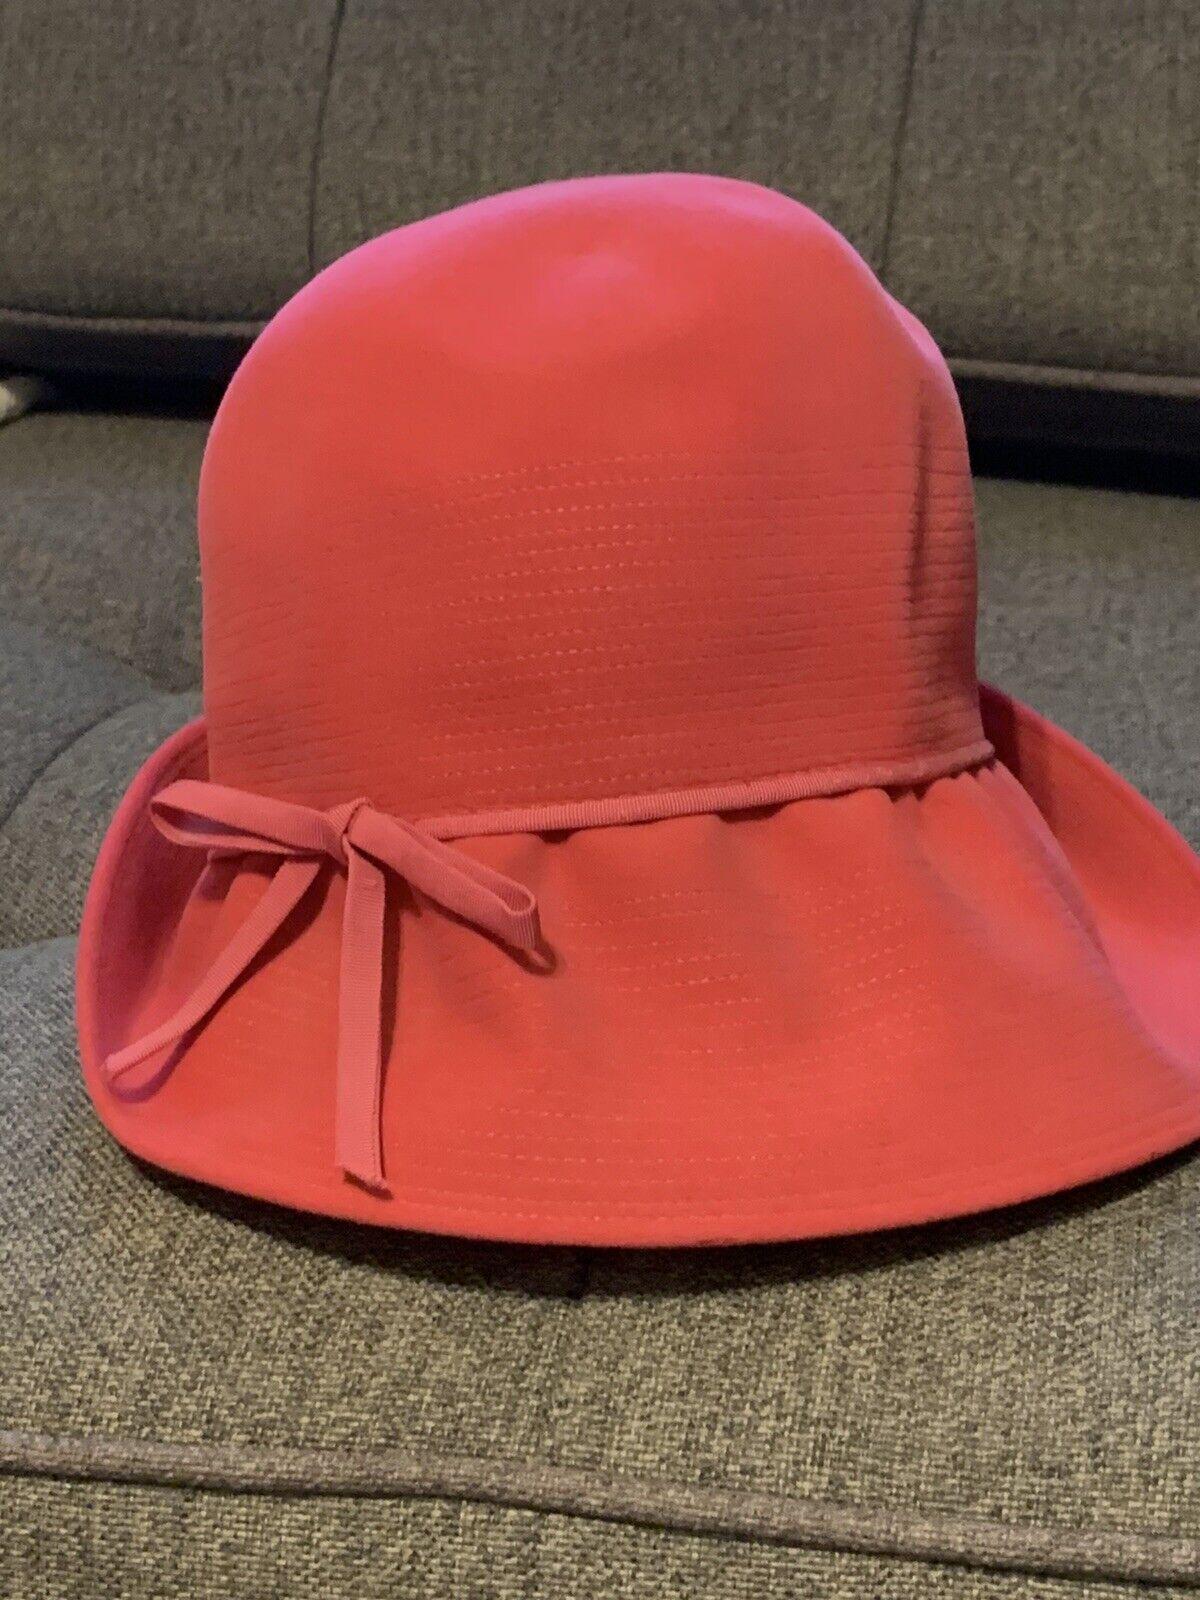 CHRISTIAN DIOR VINTAGE PINK BUCKET STYLE HAT - image 2